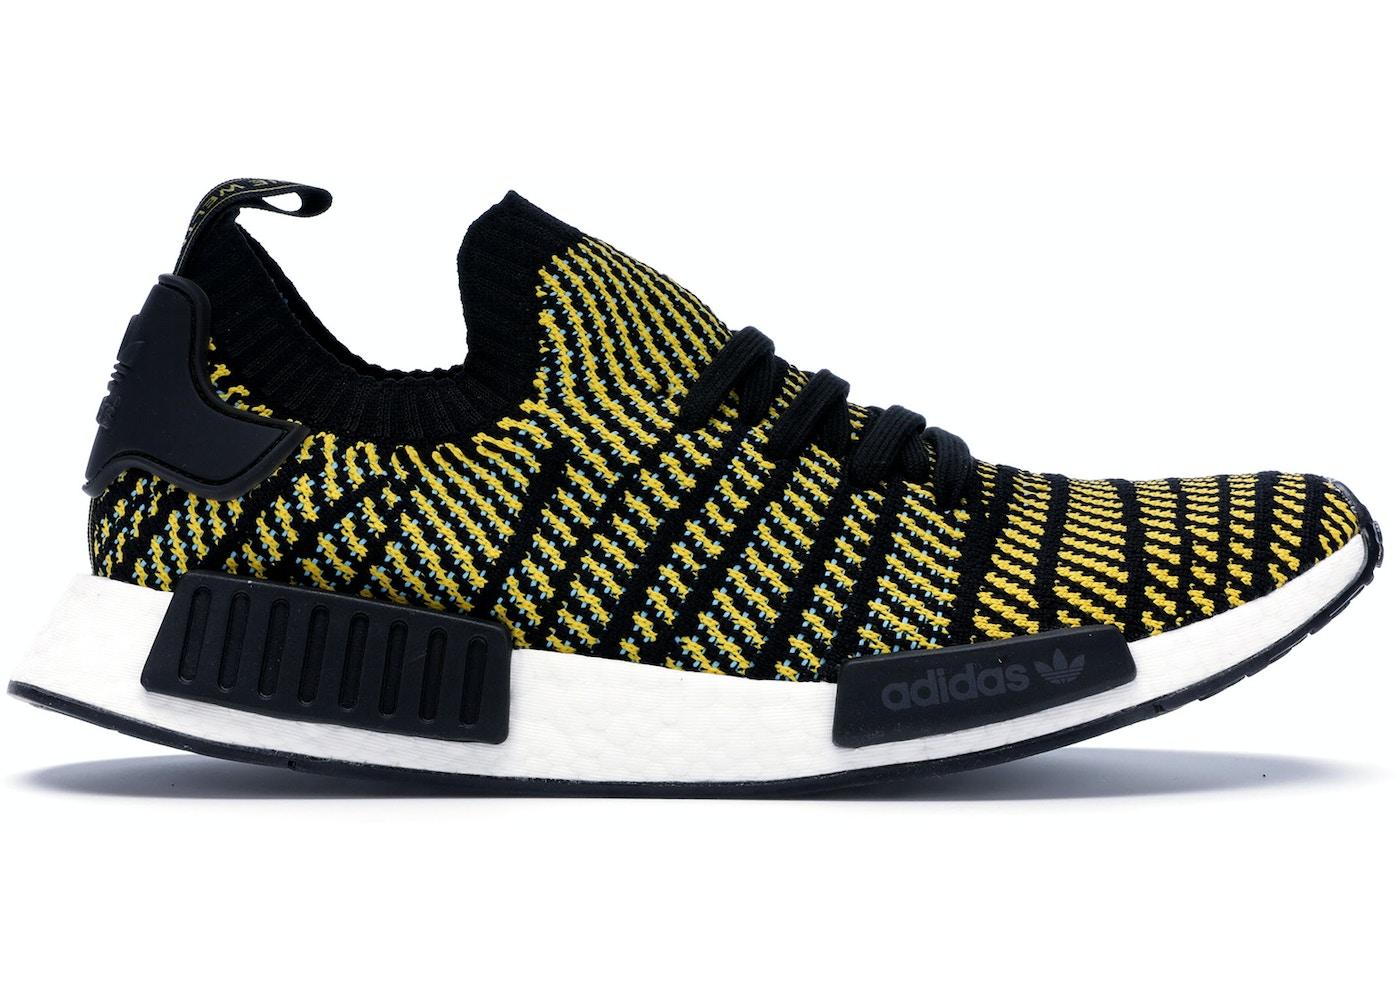 new styles bc2d7 6d2c2 adidas NMD R1 STLT Black Yellow